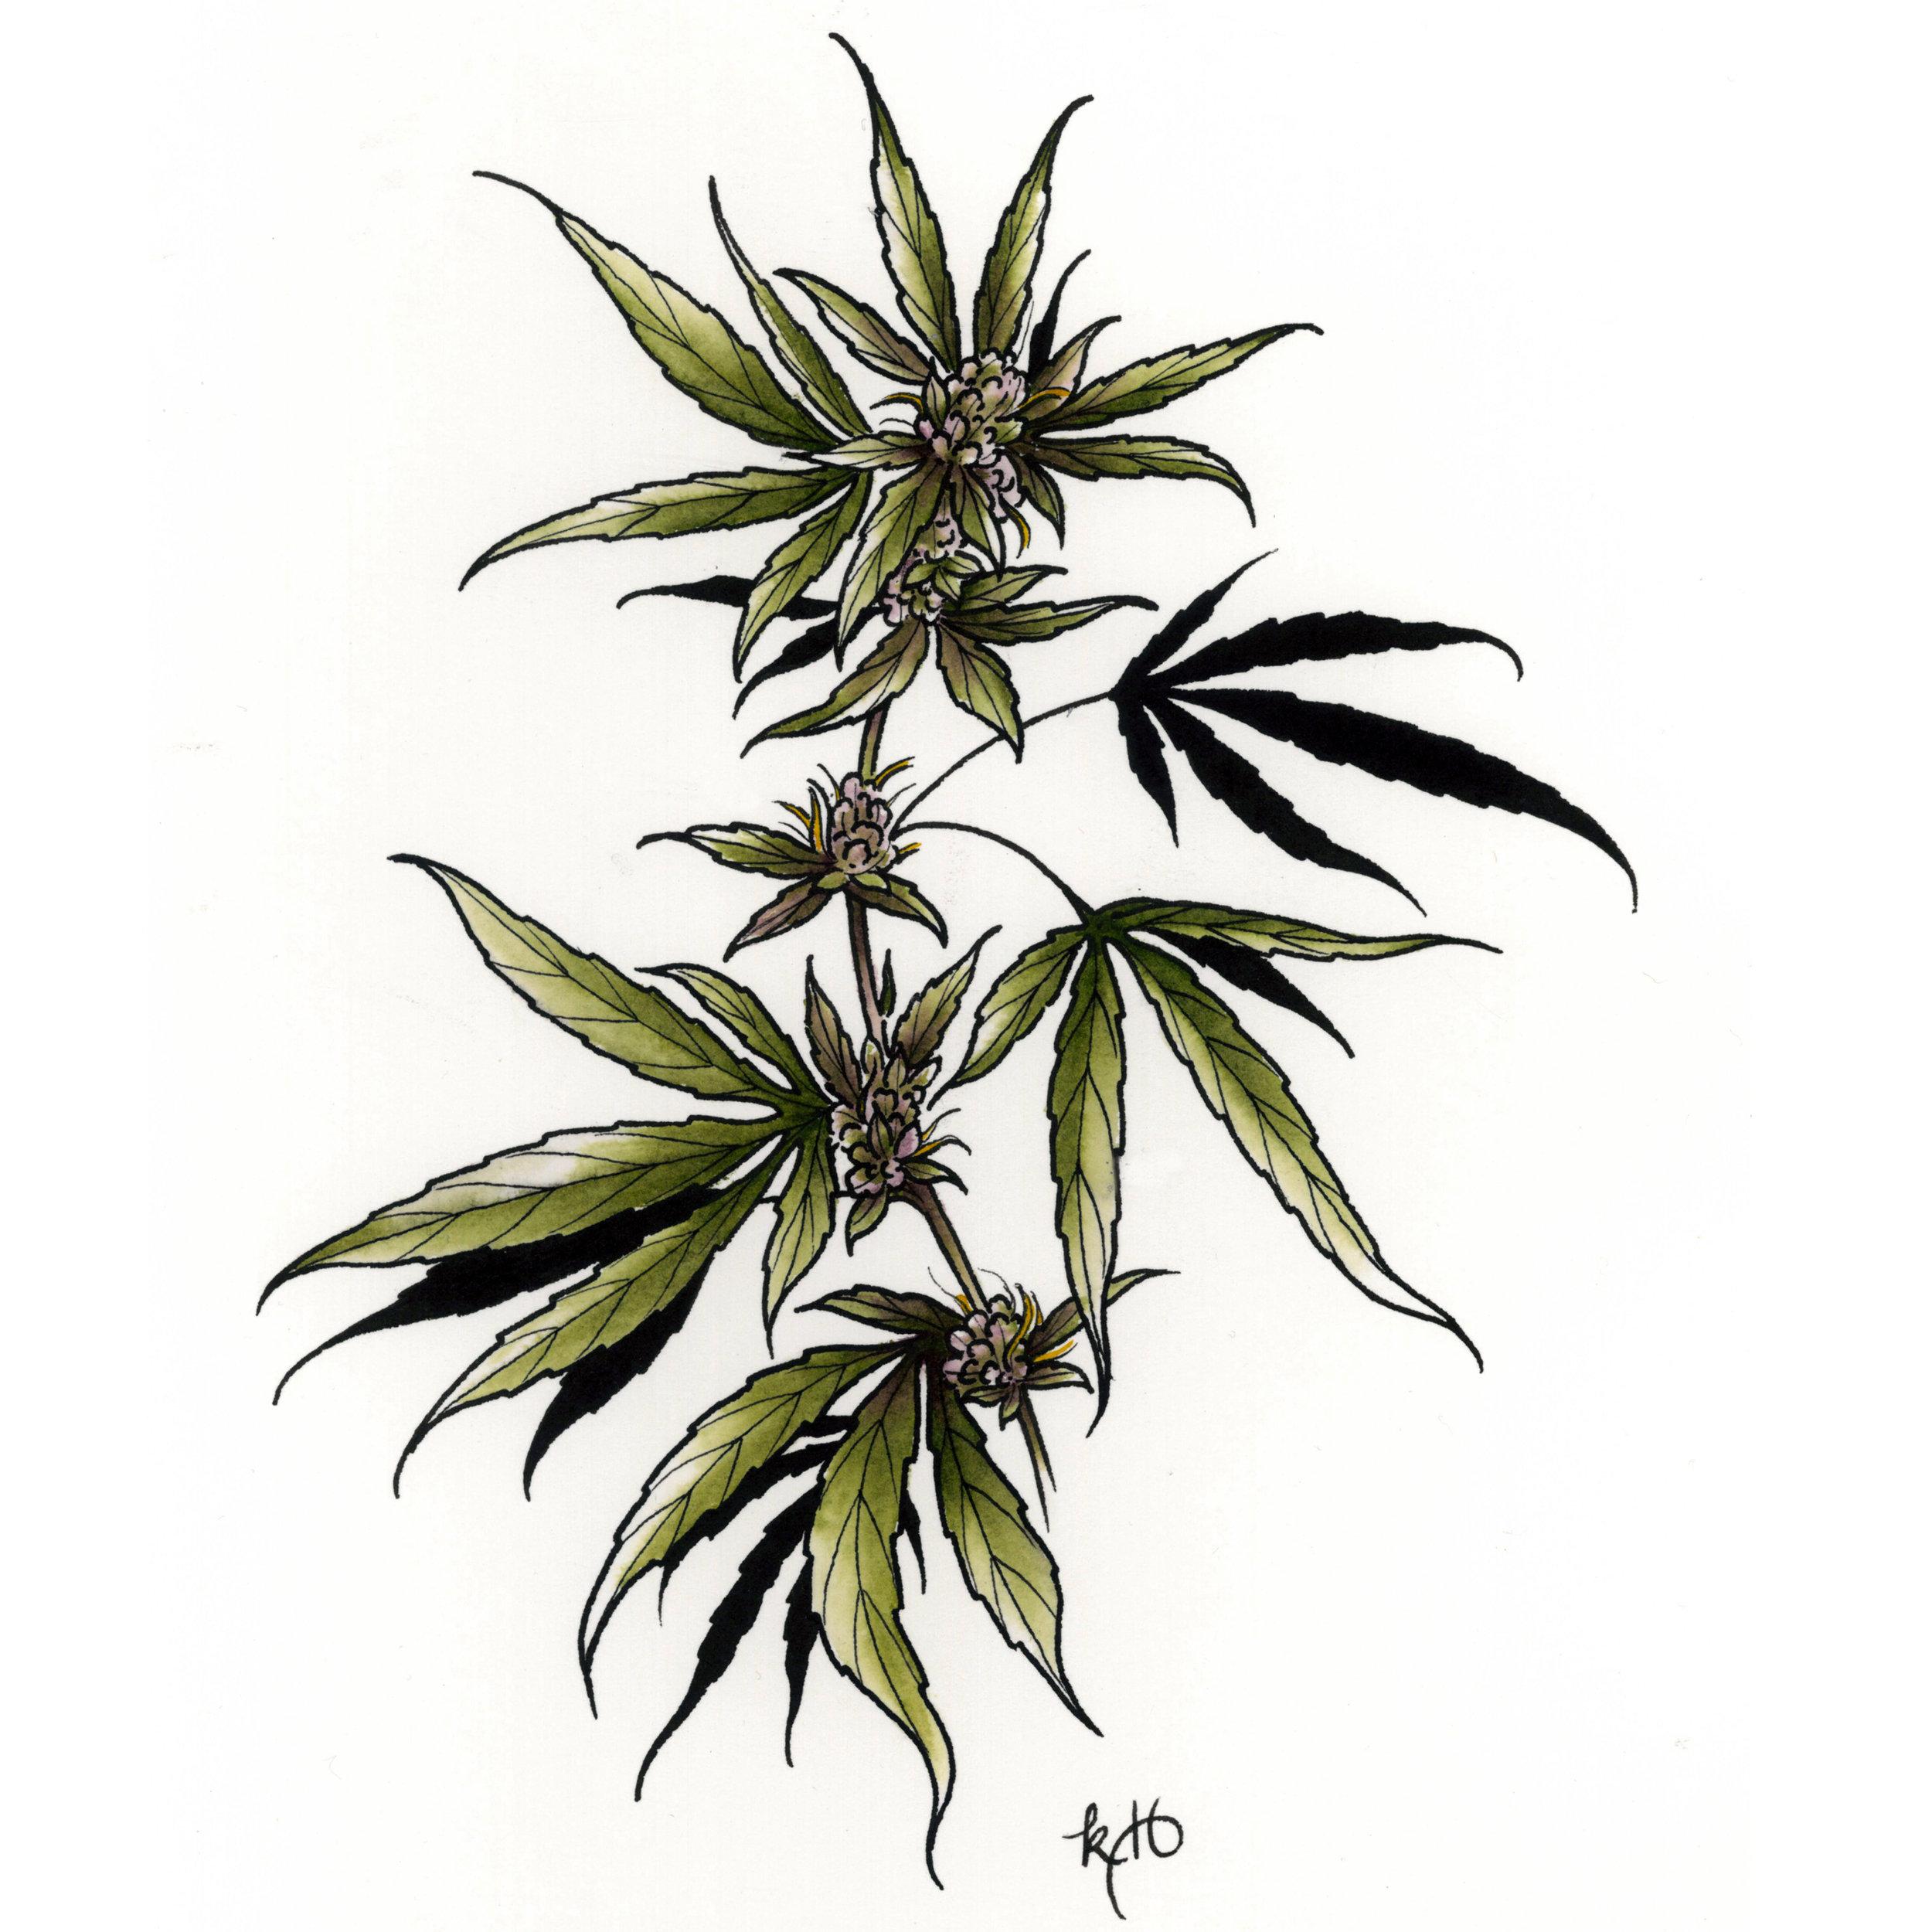 Botanical illustration of cannabis plant. © Kirsten Holliday.